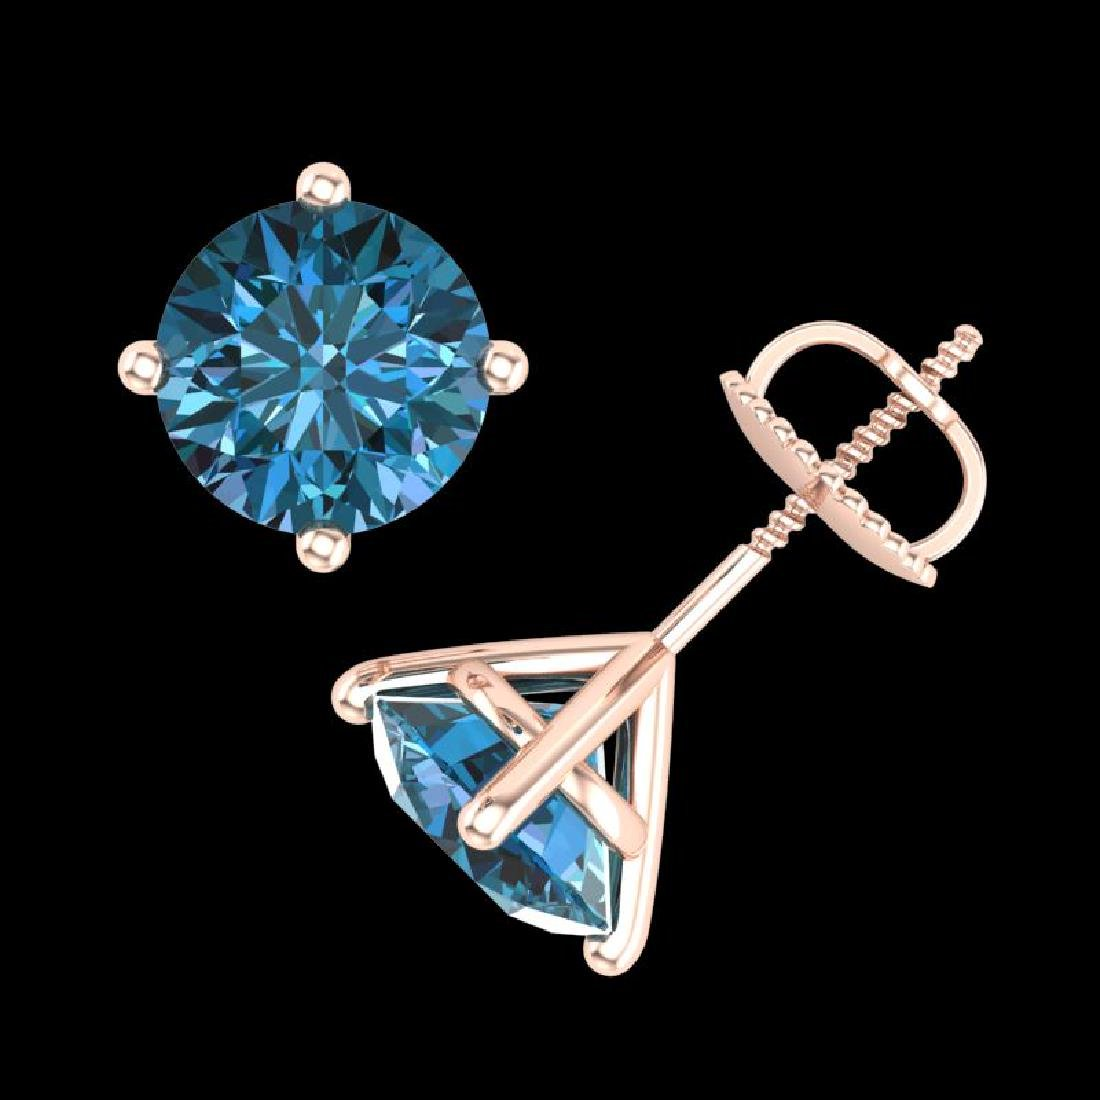 3.01 CTW Fancy Intense Blue Diamond Art Deco Stud - 3